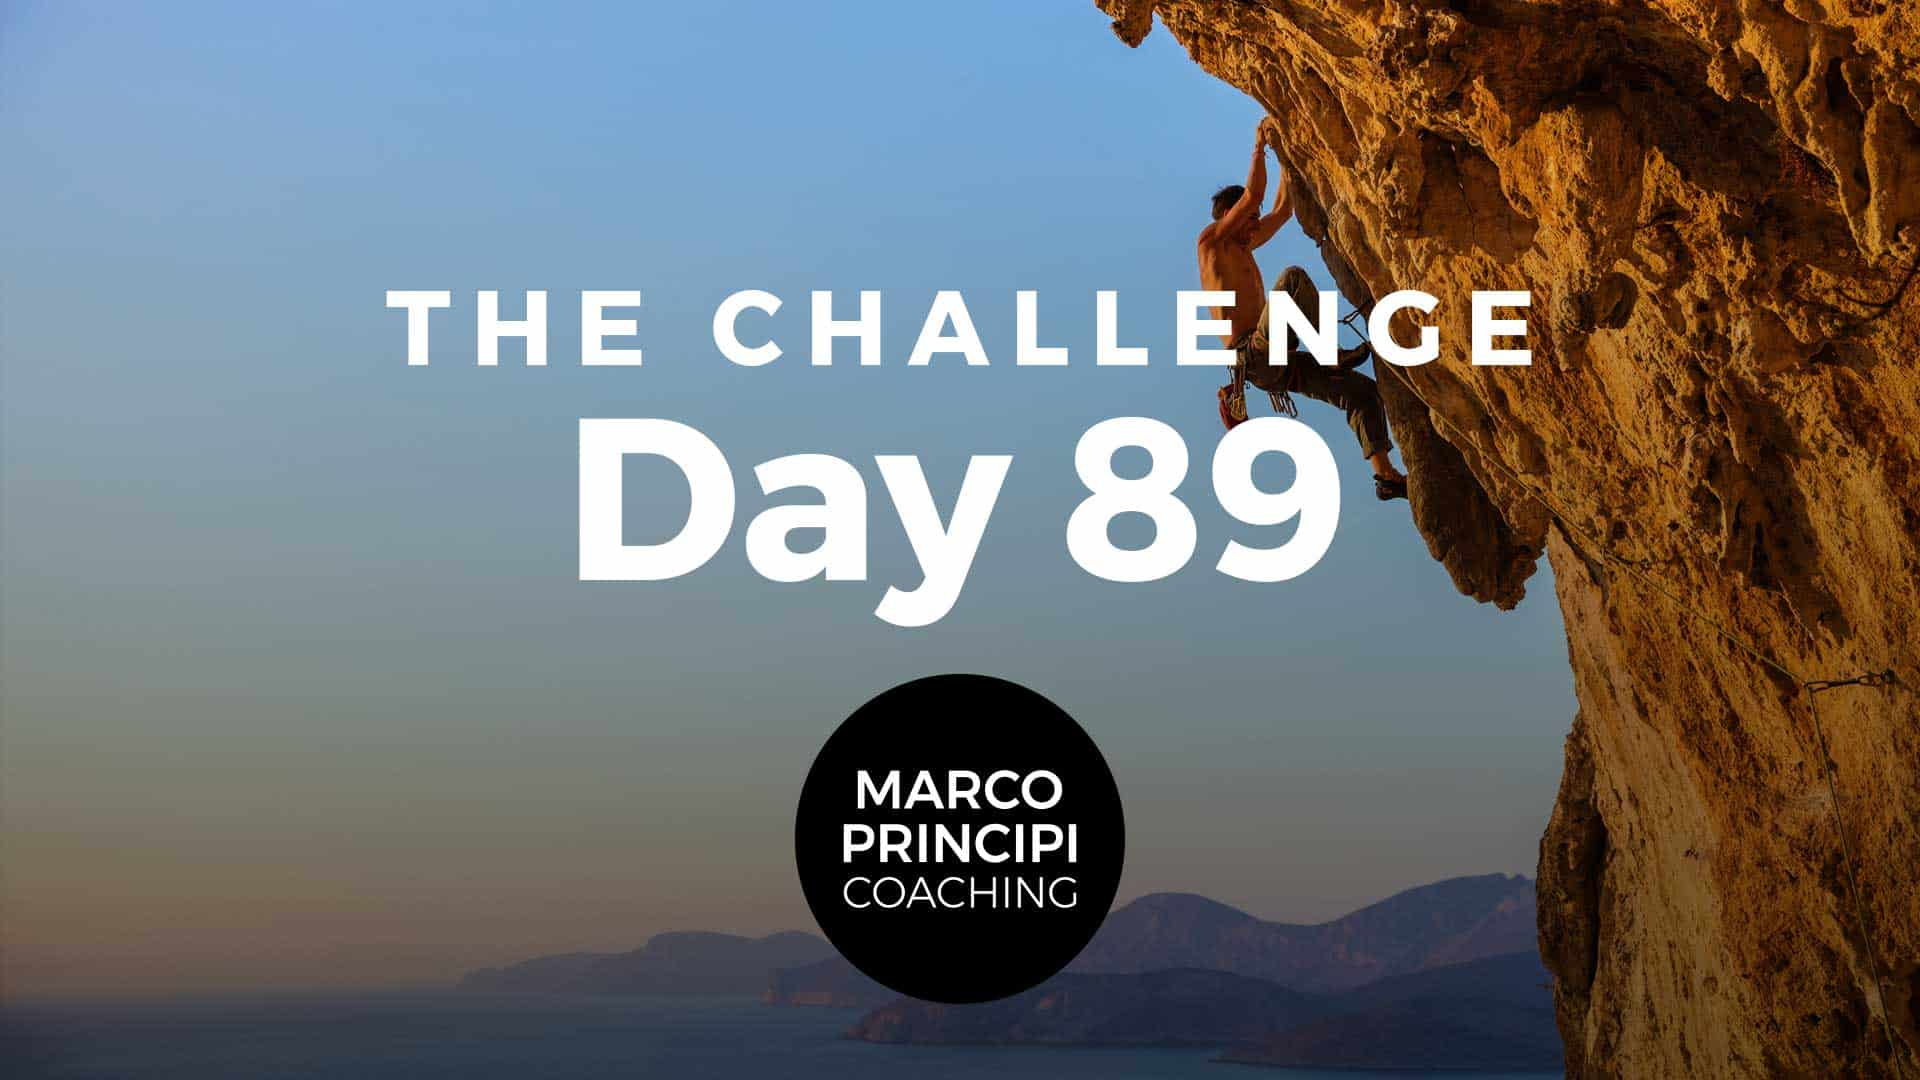 Marco Principi Coaching Challenge Day 89